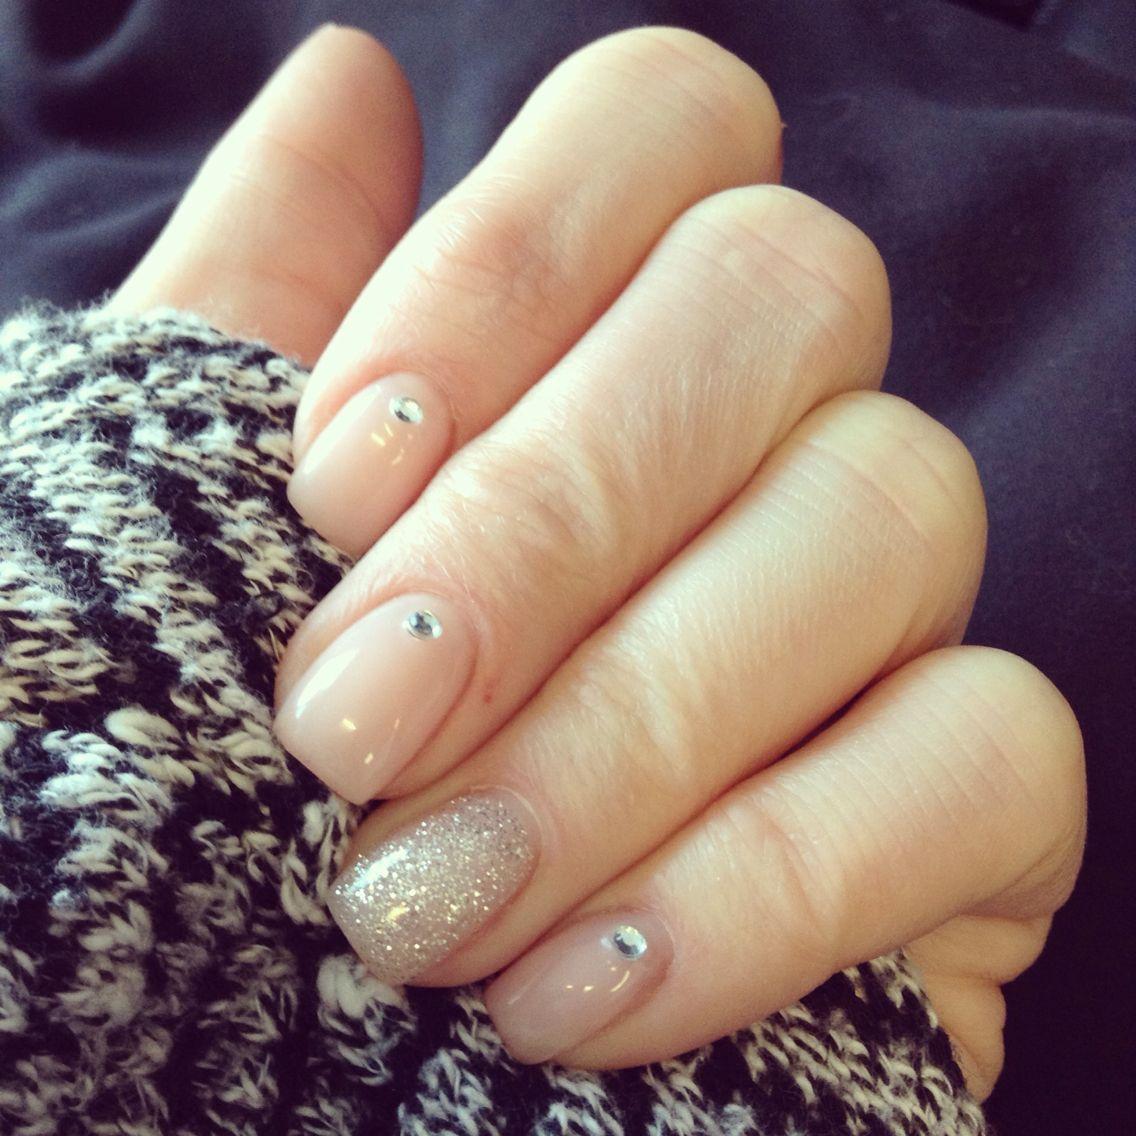 Pin on Nail art with rhinestones